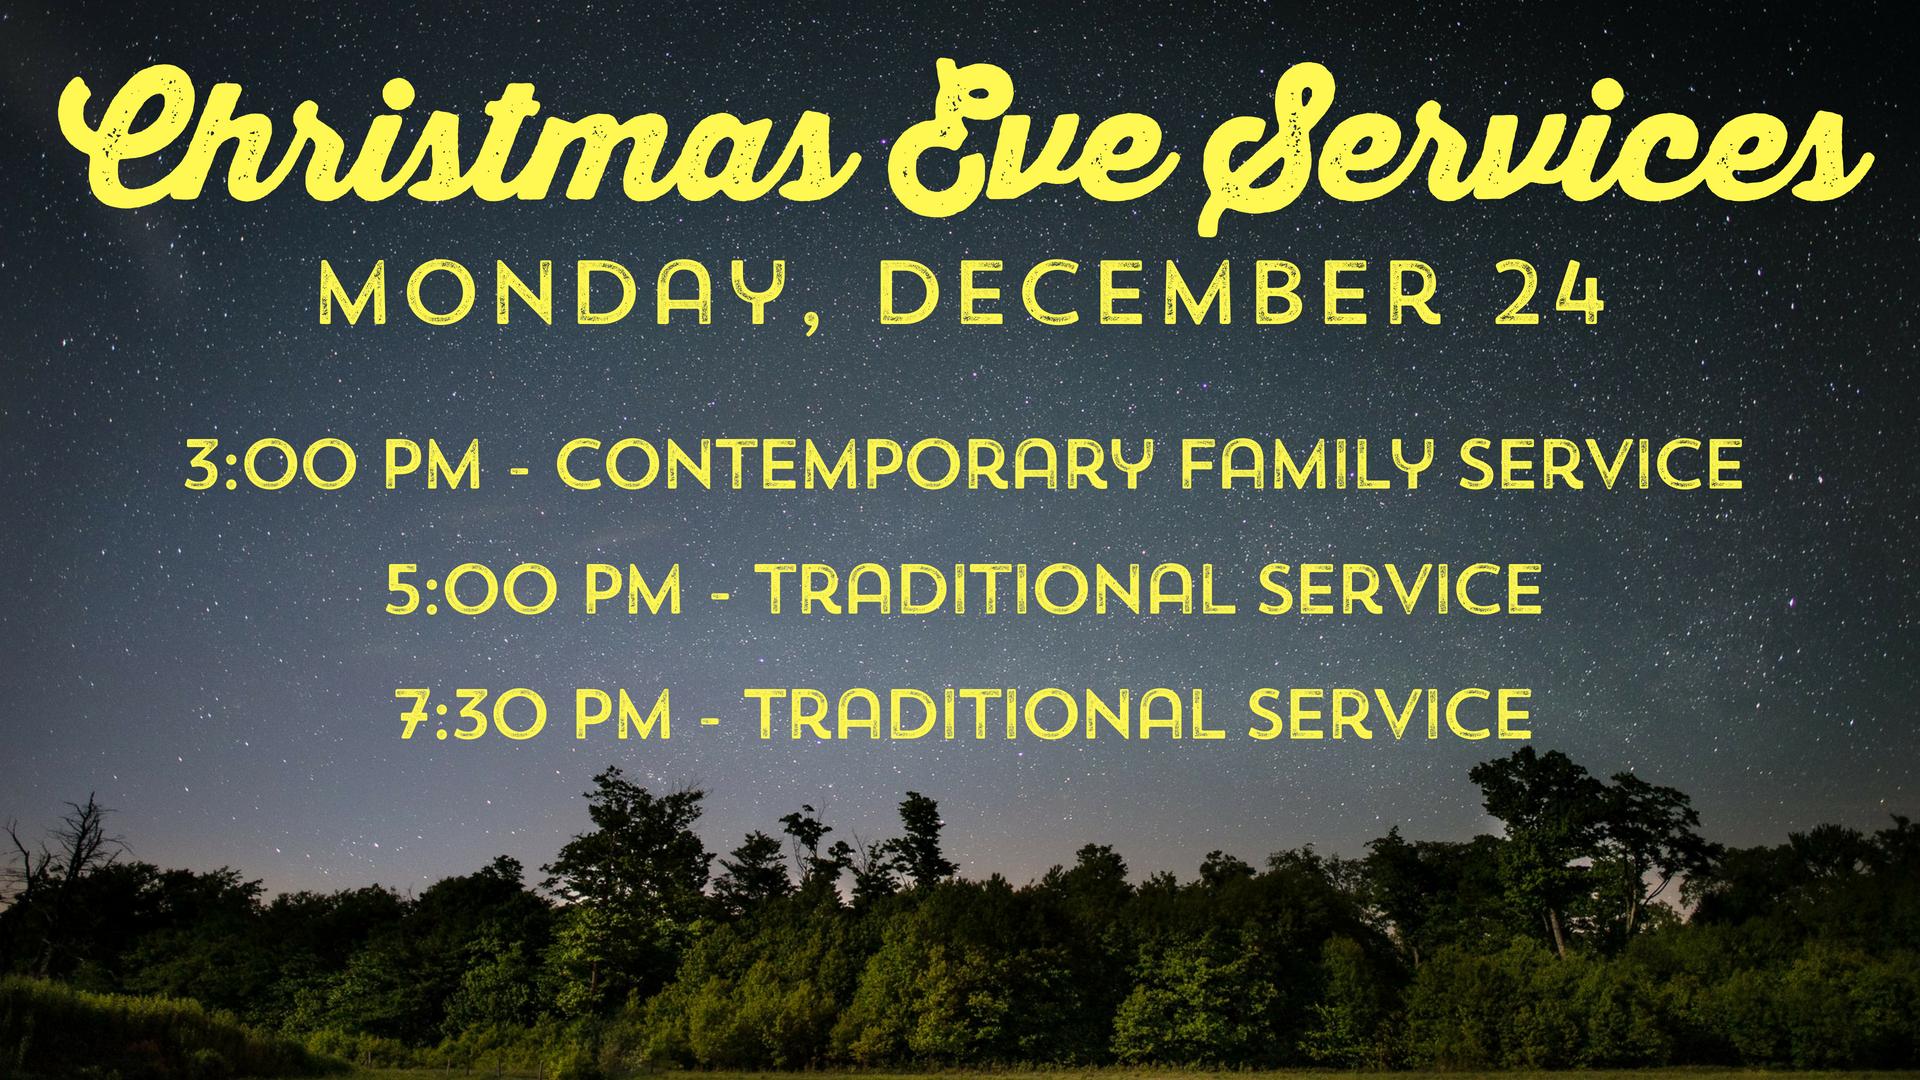 Christmas Eve Services Near Me.Christmas Eve Services Wesley Memorial Umc Wilmington Nc